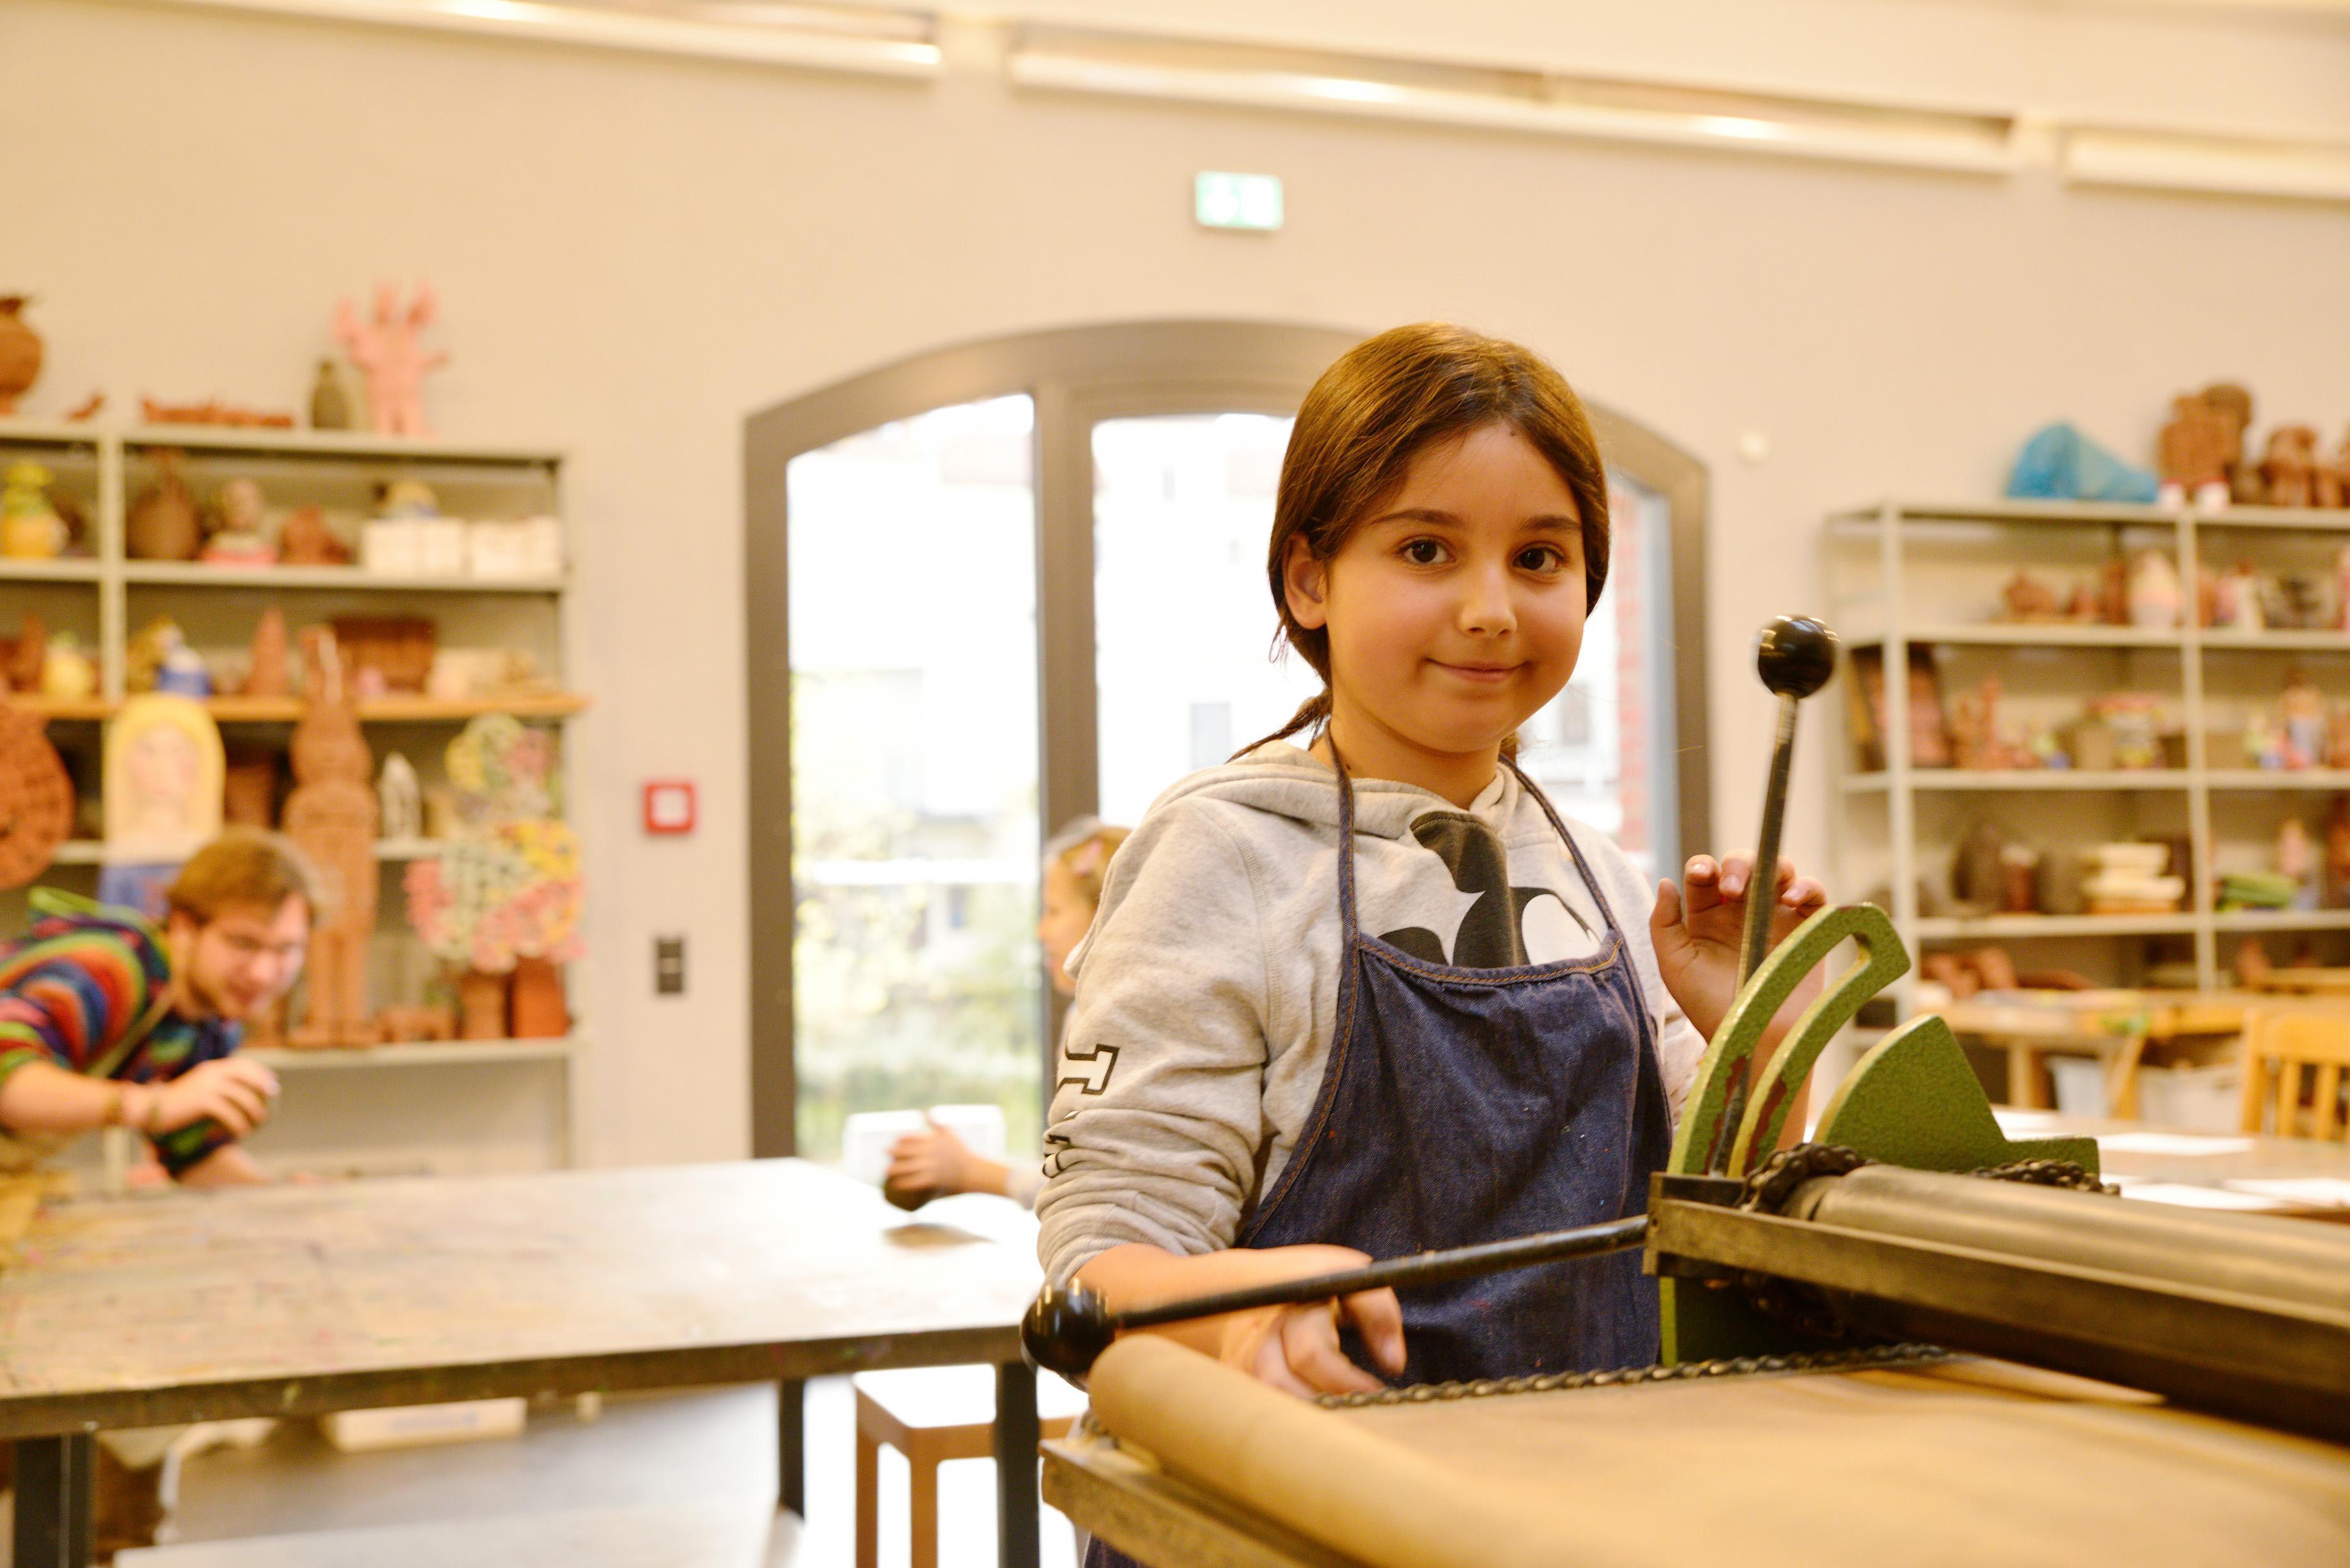 Kunstunterricht der Kunstschule Wredow